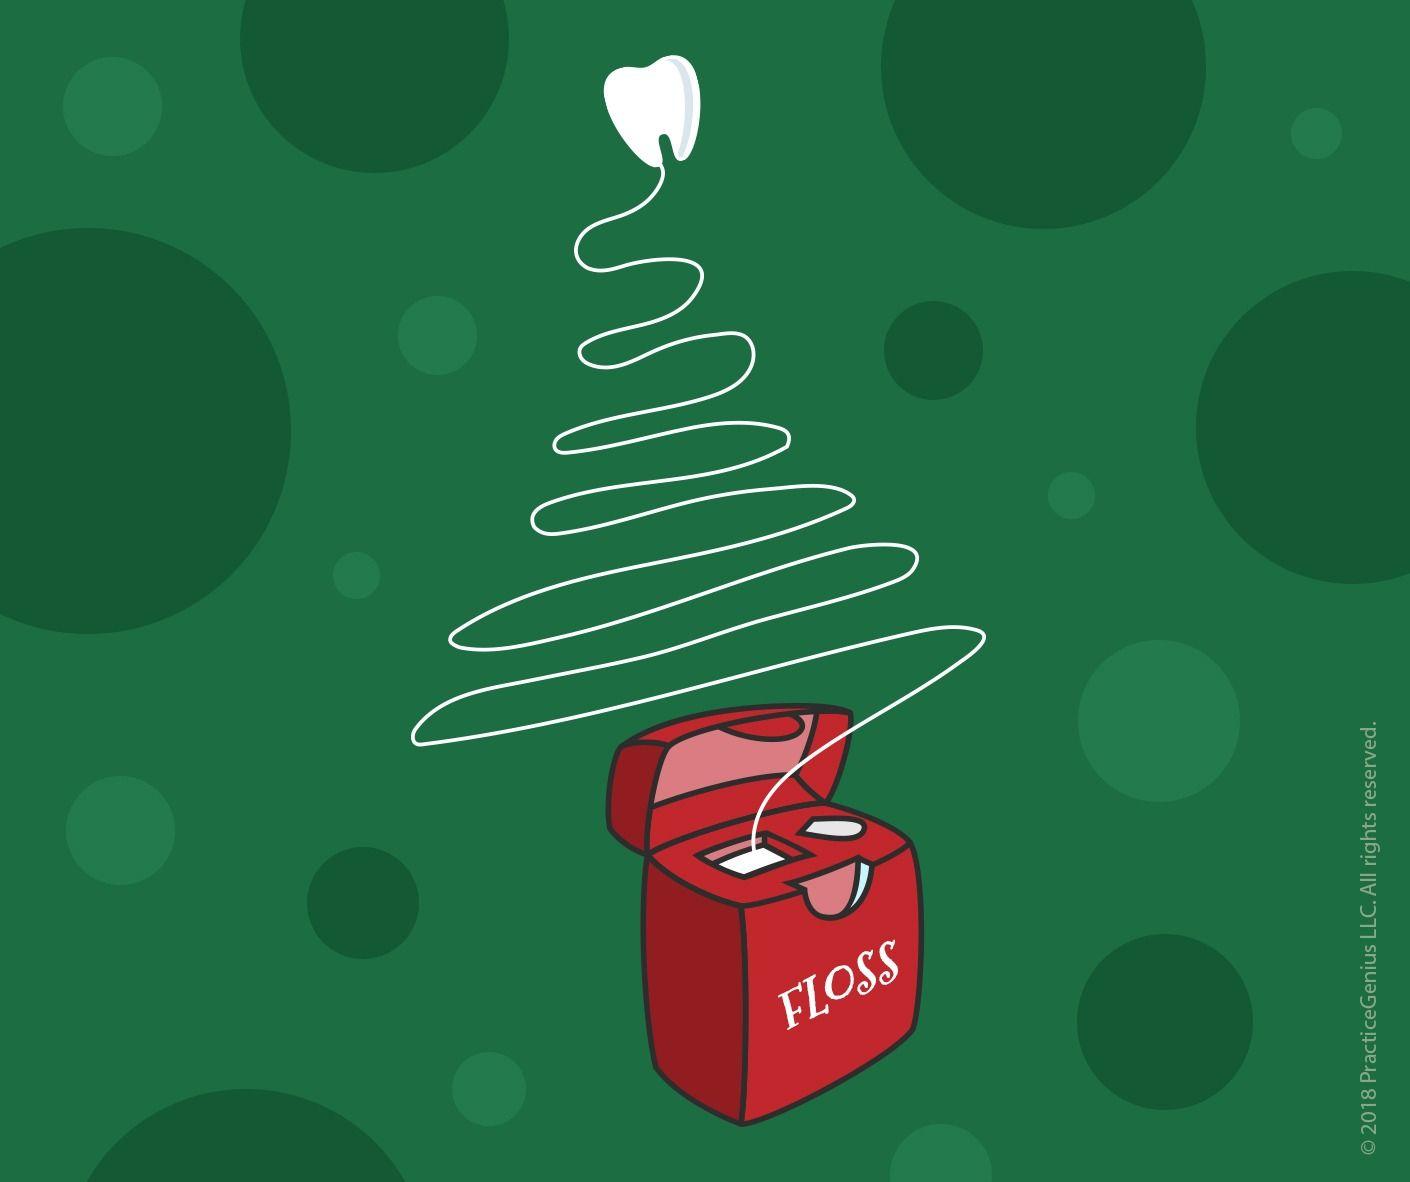 Pin By Jacobson Tsou Orthodontics On Orthodontic Tips Tricks Dental Humor Happy Dental Orthodontic Humor